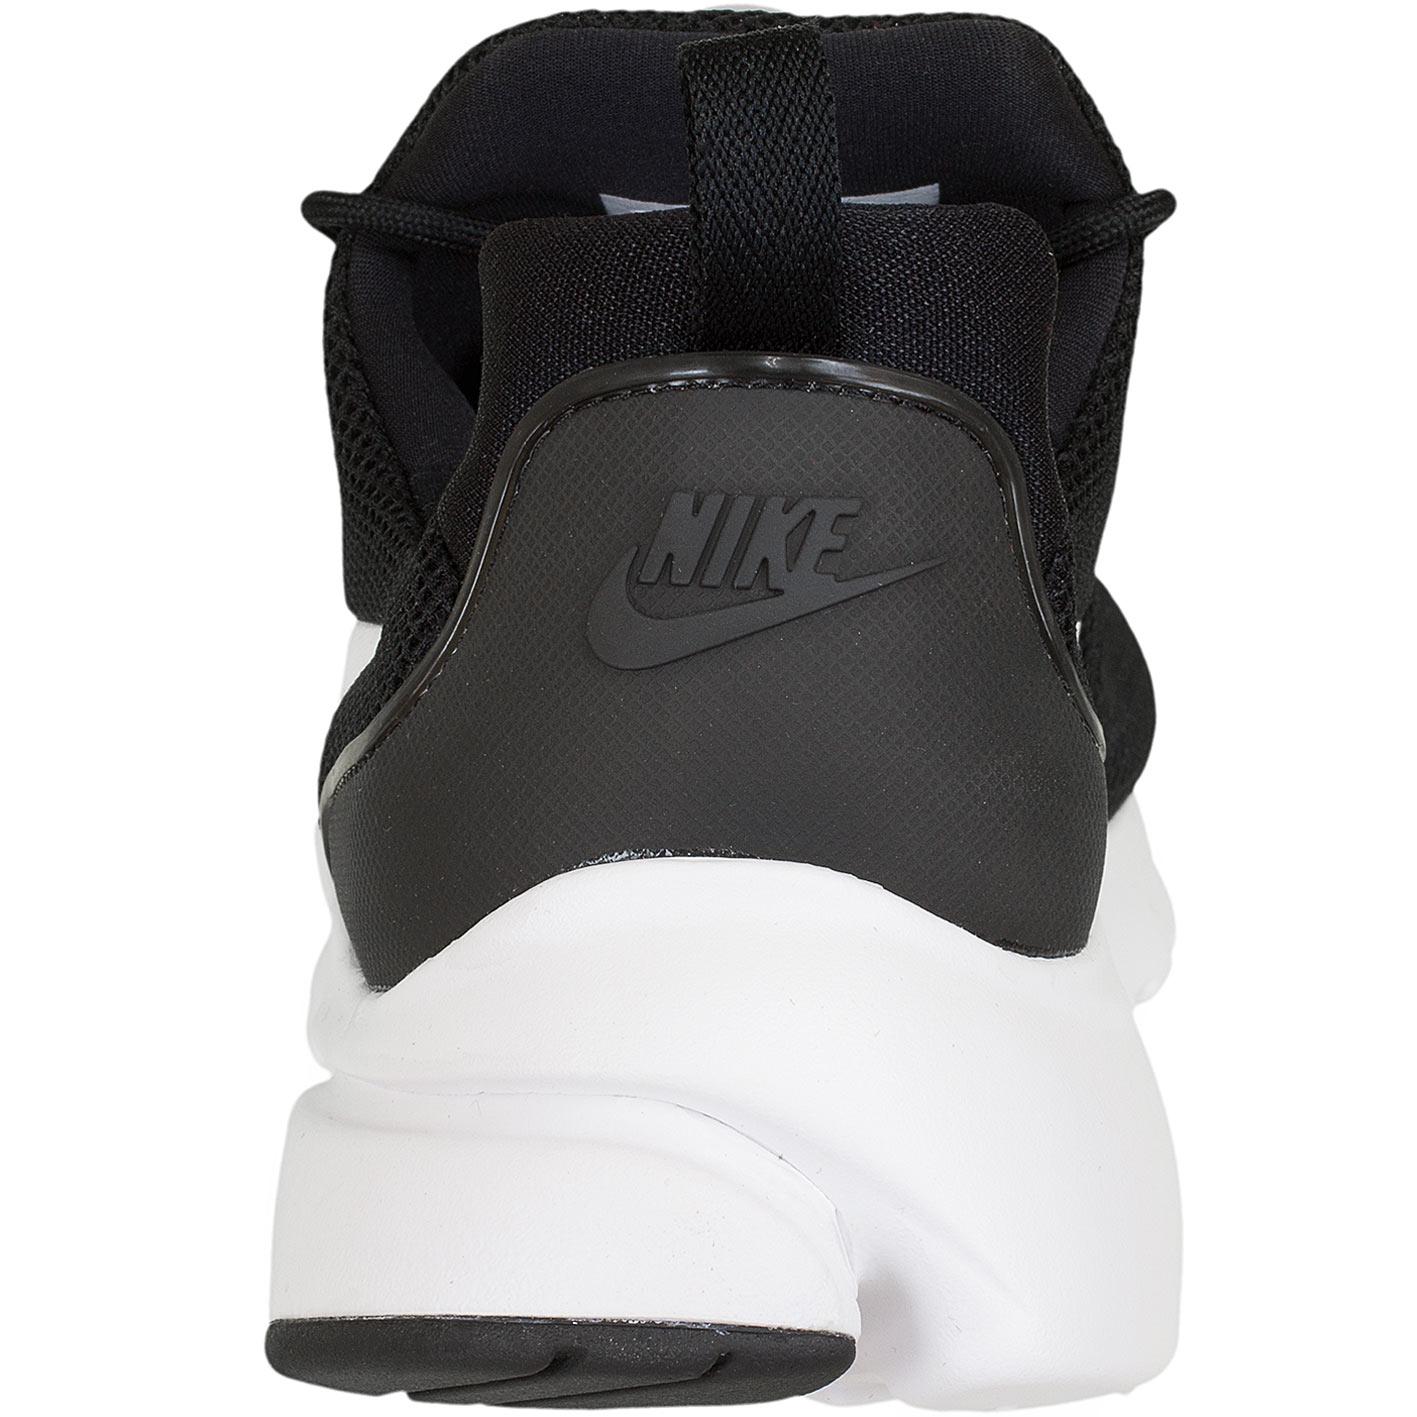 ☆ Nike Sneaker Presto Fly schwarz/weiß - hier bestellen!